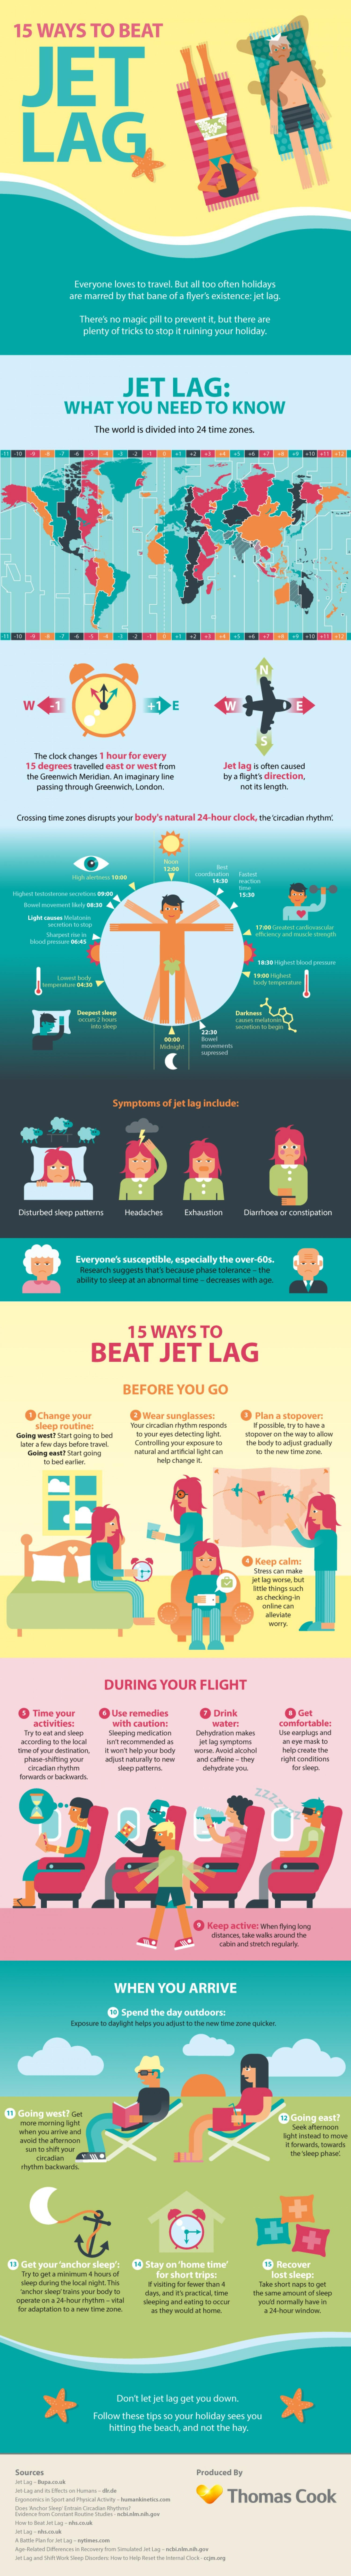 15-ways-to-beat-jet-lag_53c66a07a345c_w1500